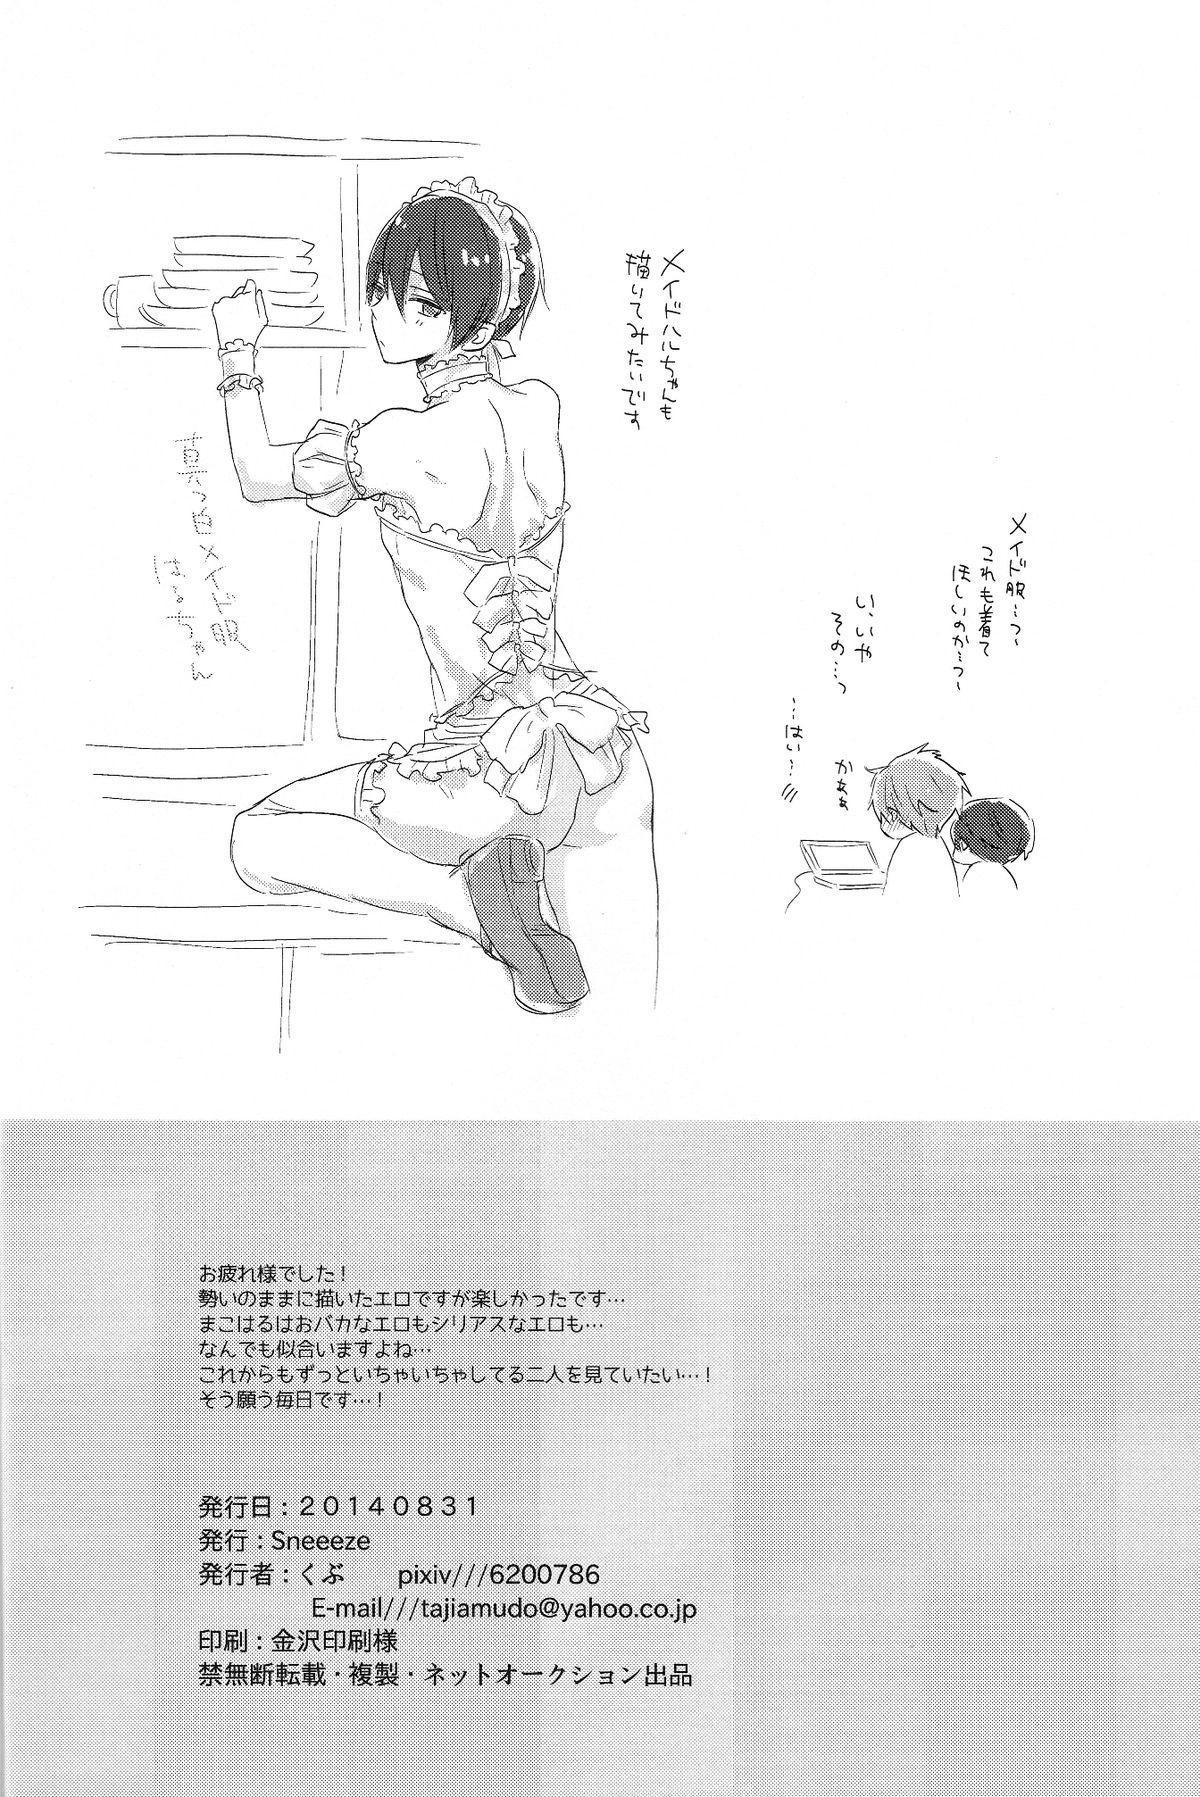 (Renai Endorphin 2) [Sneeeze (Kubu)] Cheer Haru-chan no Yuutsu | The Melancholy of Cheerleader Haru-chan (Free!) [English] {Anneioux} 24